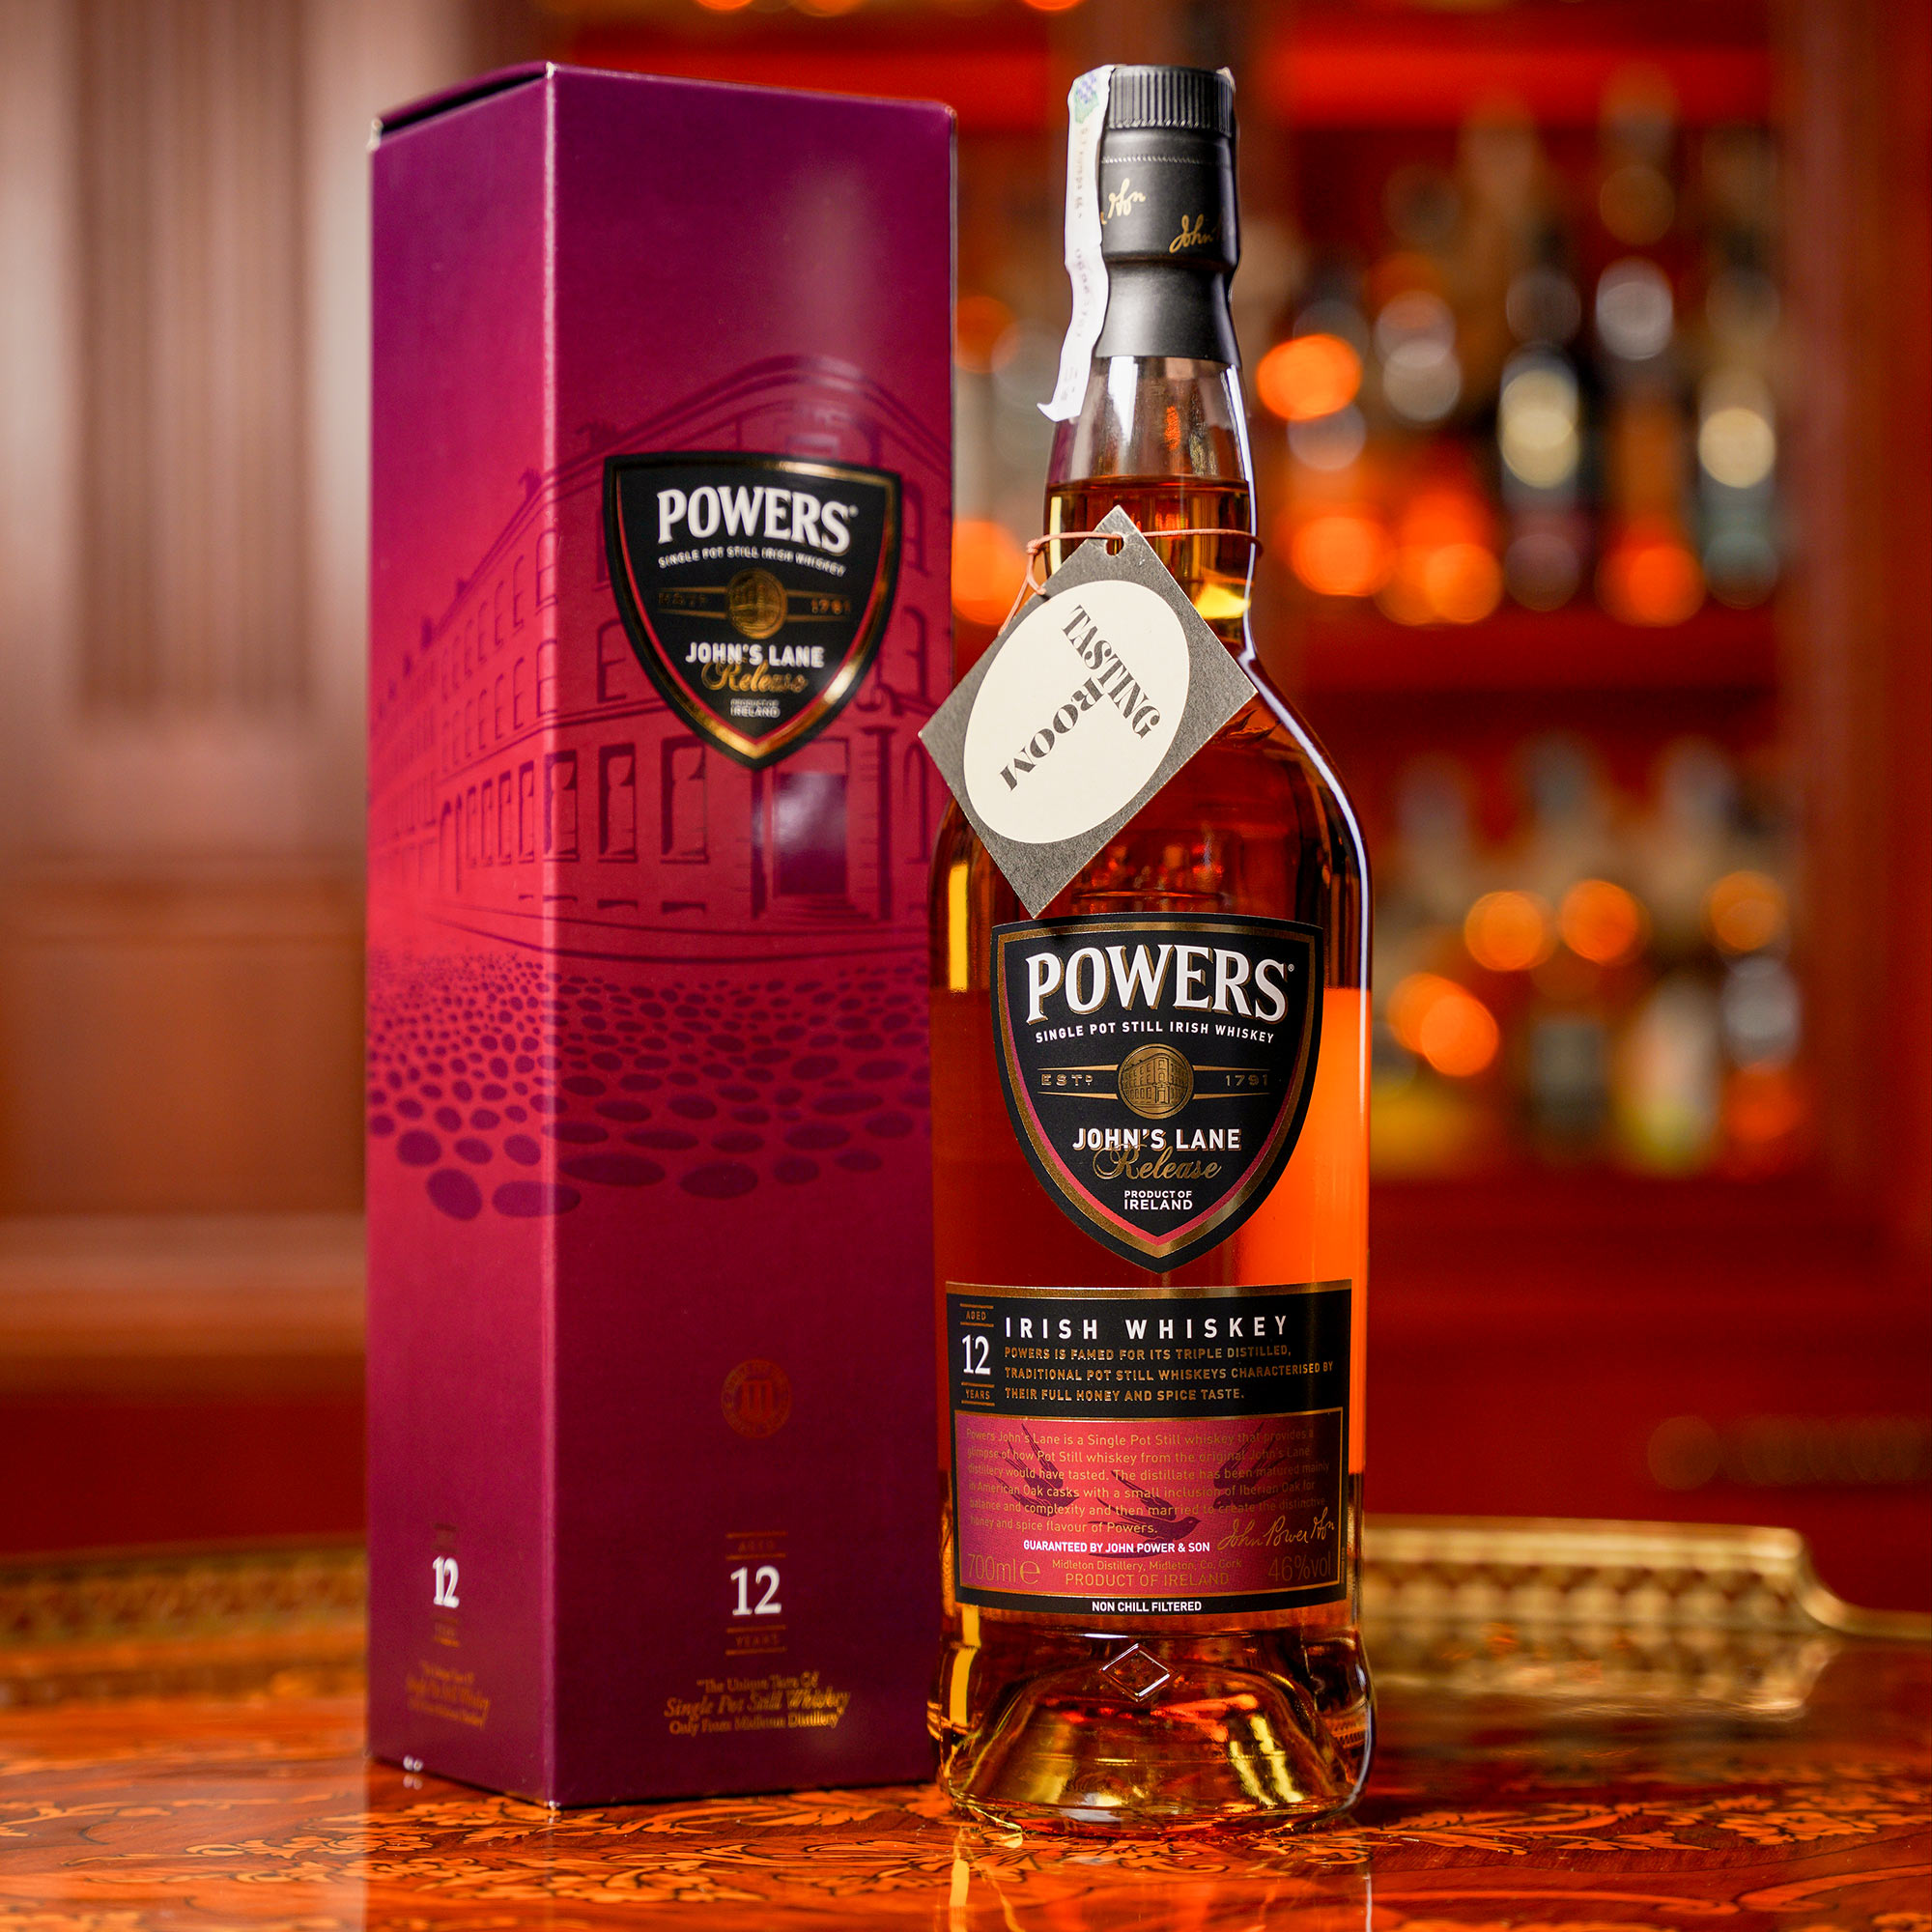 Powers 12 YO John's Lane /Пауърс 12 годишно Джон Лейн